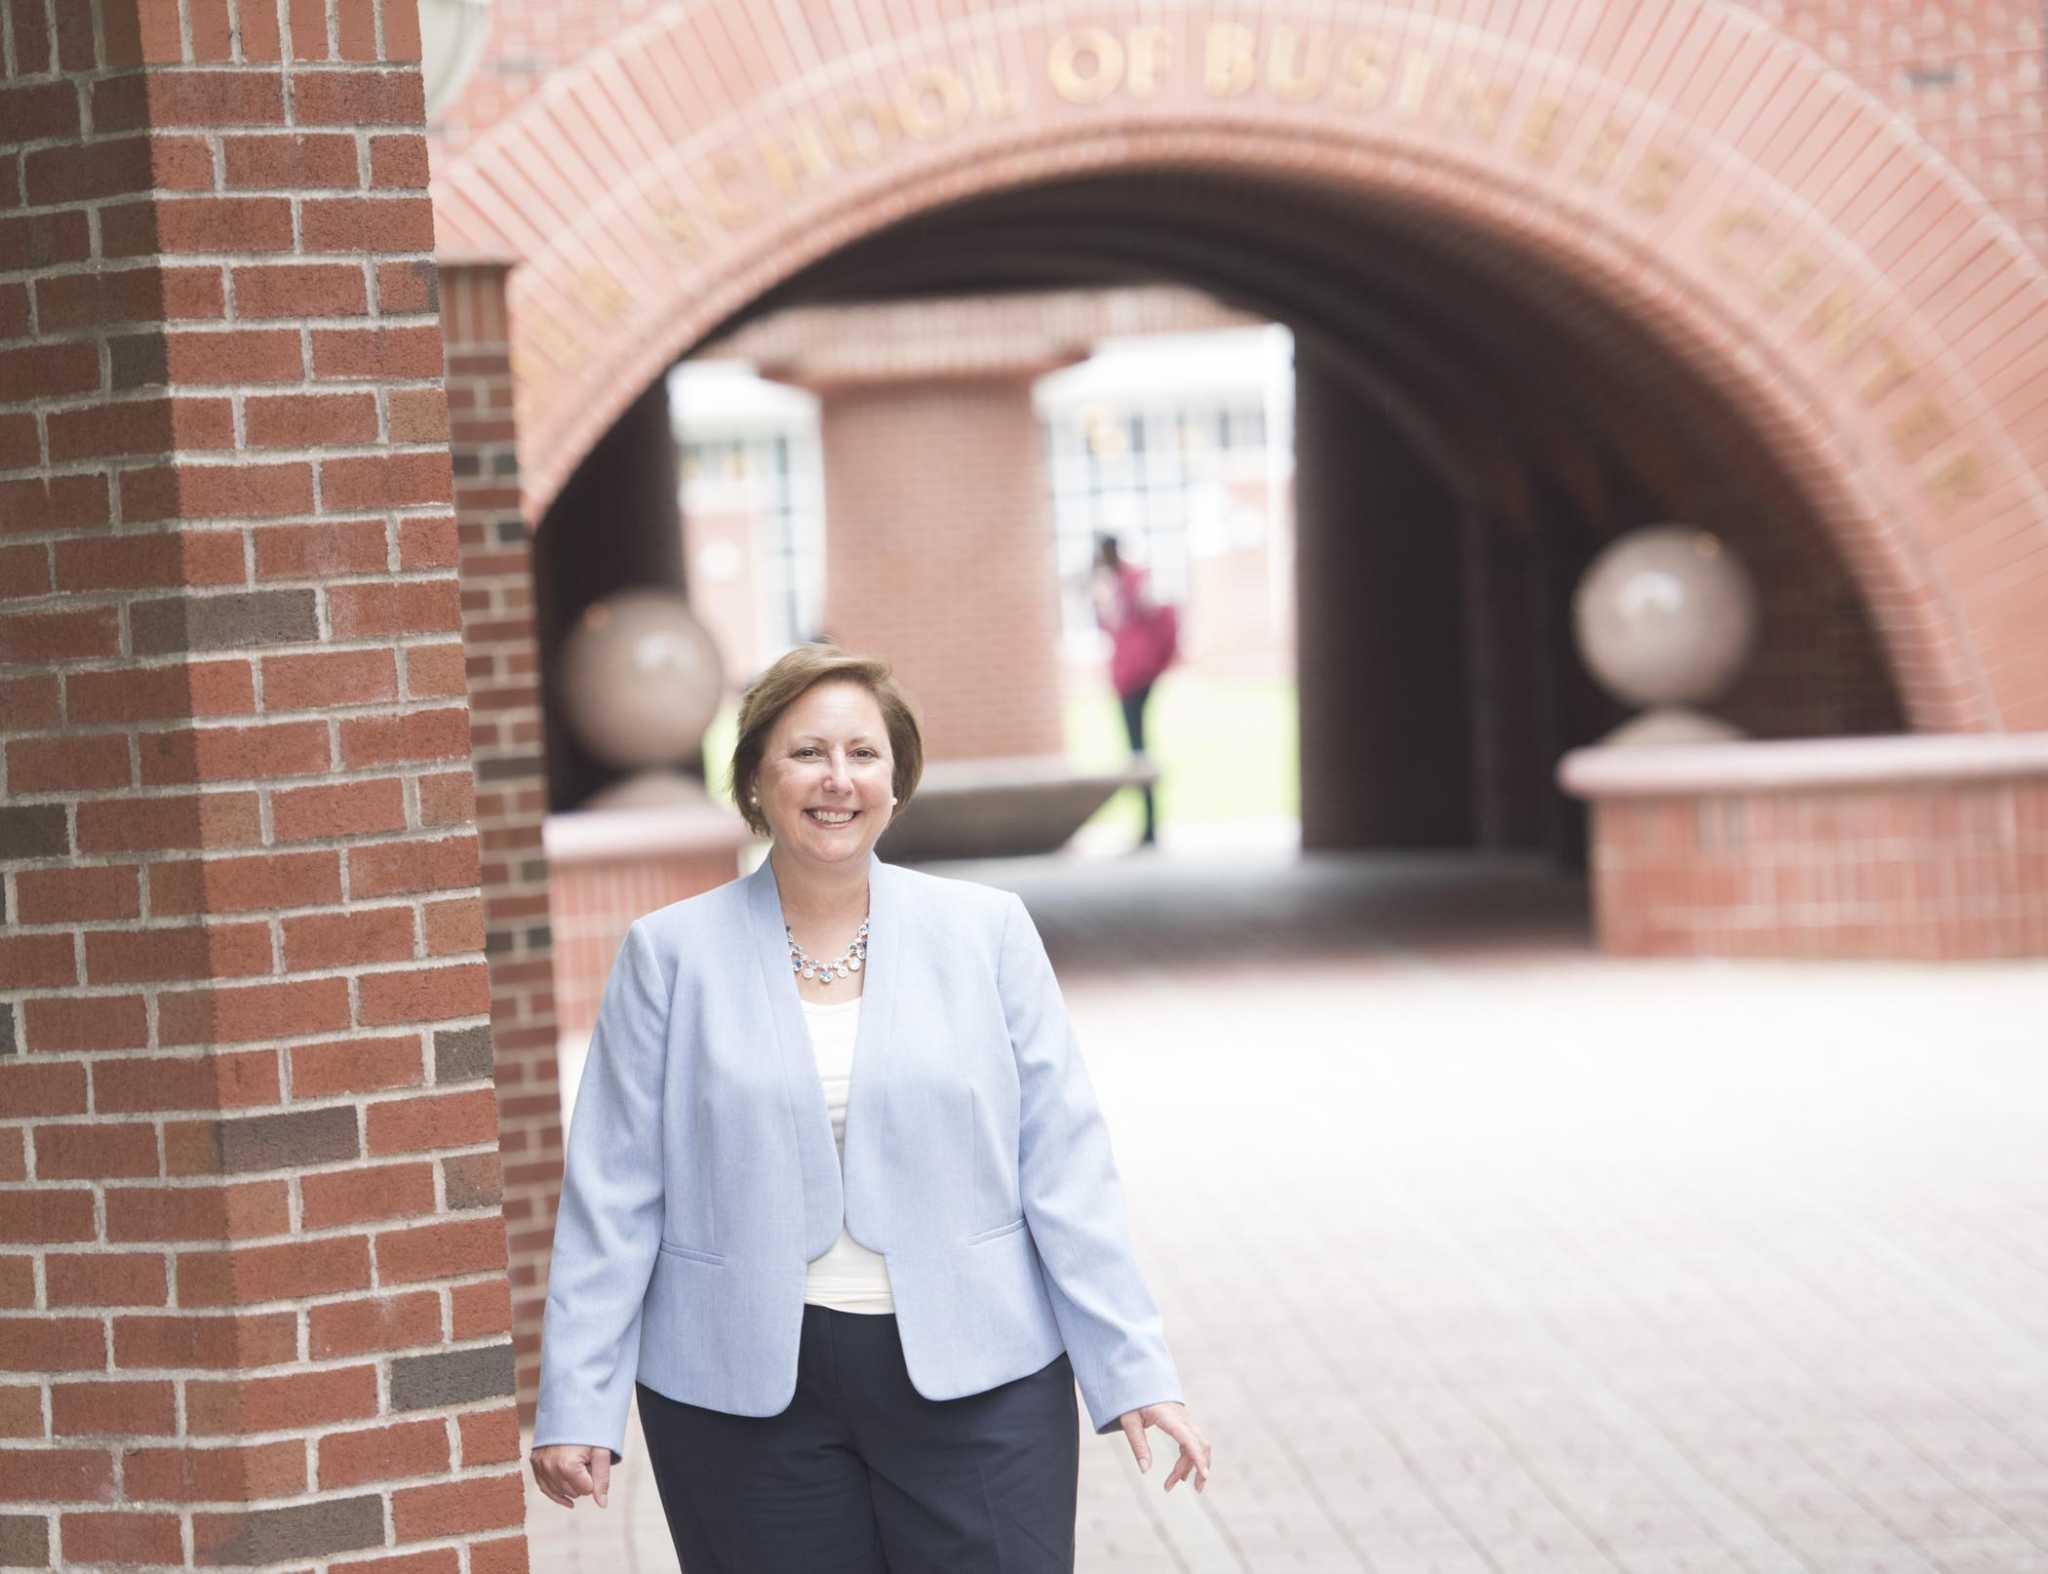 Quinnipiac's Schweitzer Institute names 2020 faculty fellows